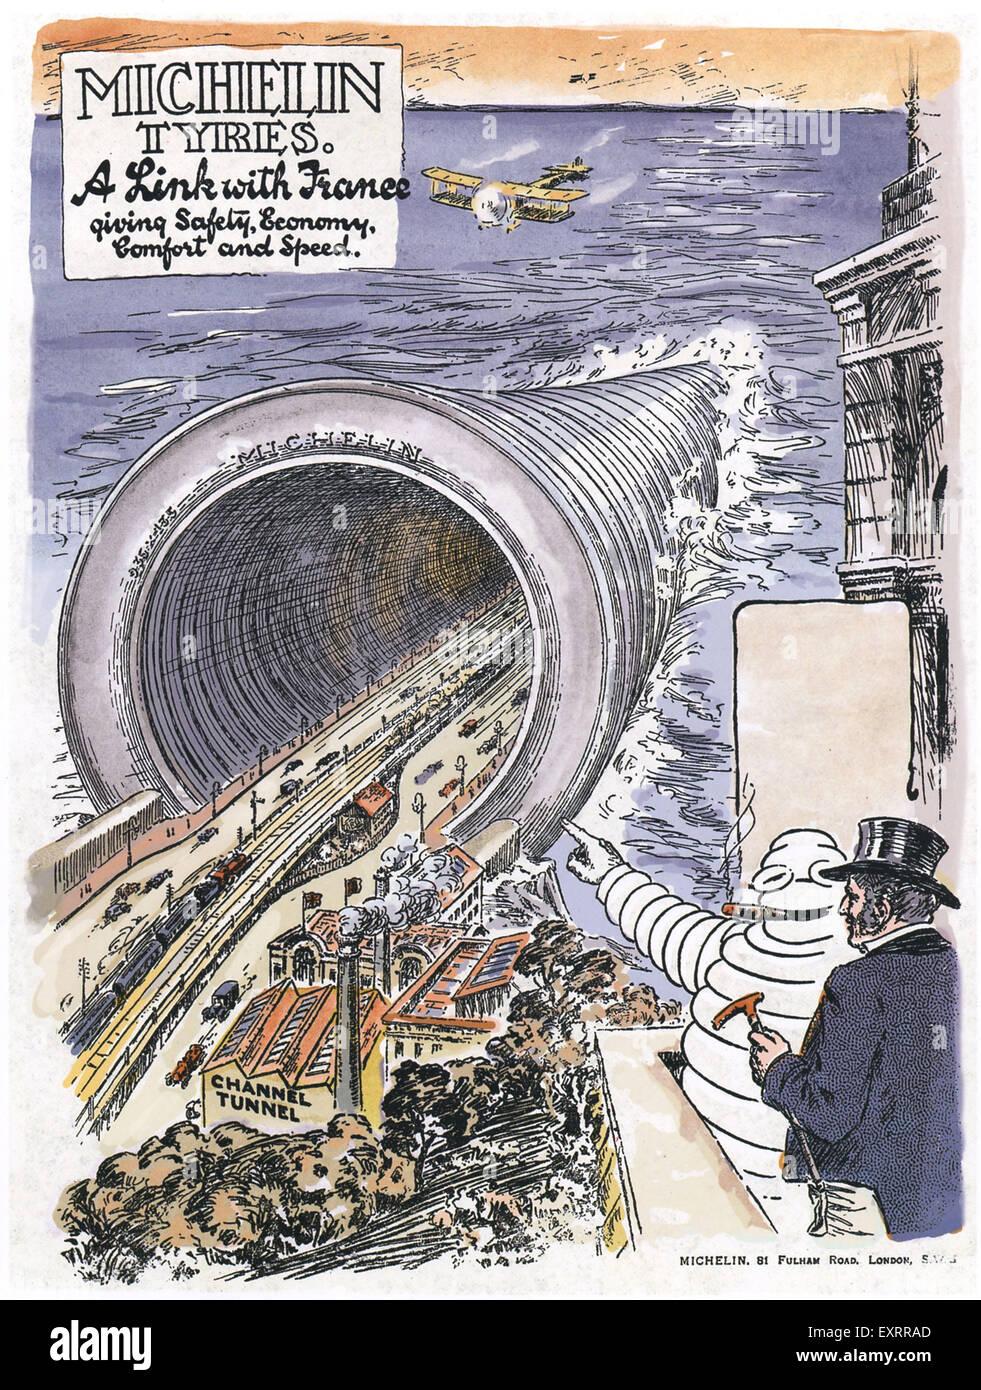 UK Michelin Magazine Advert - Stock Image